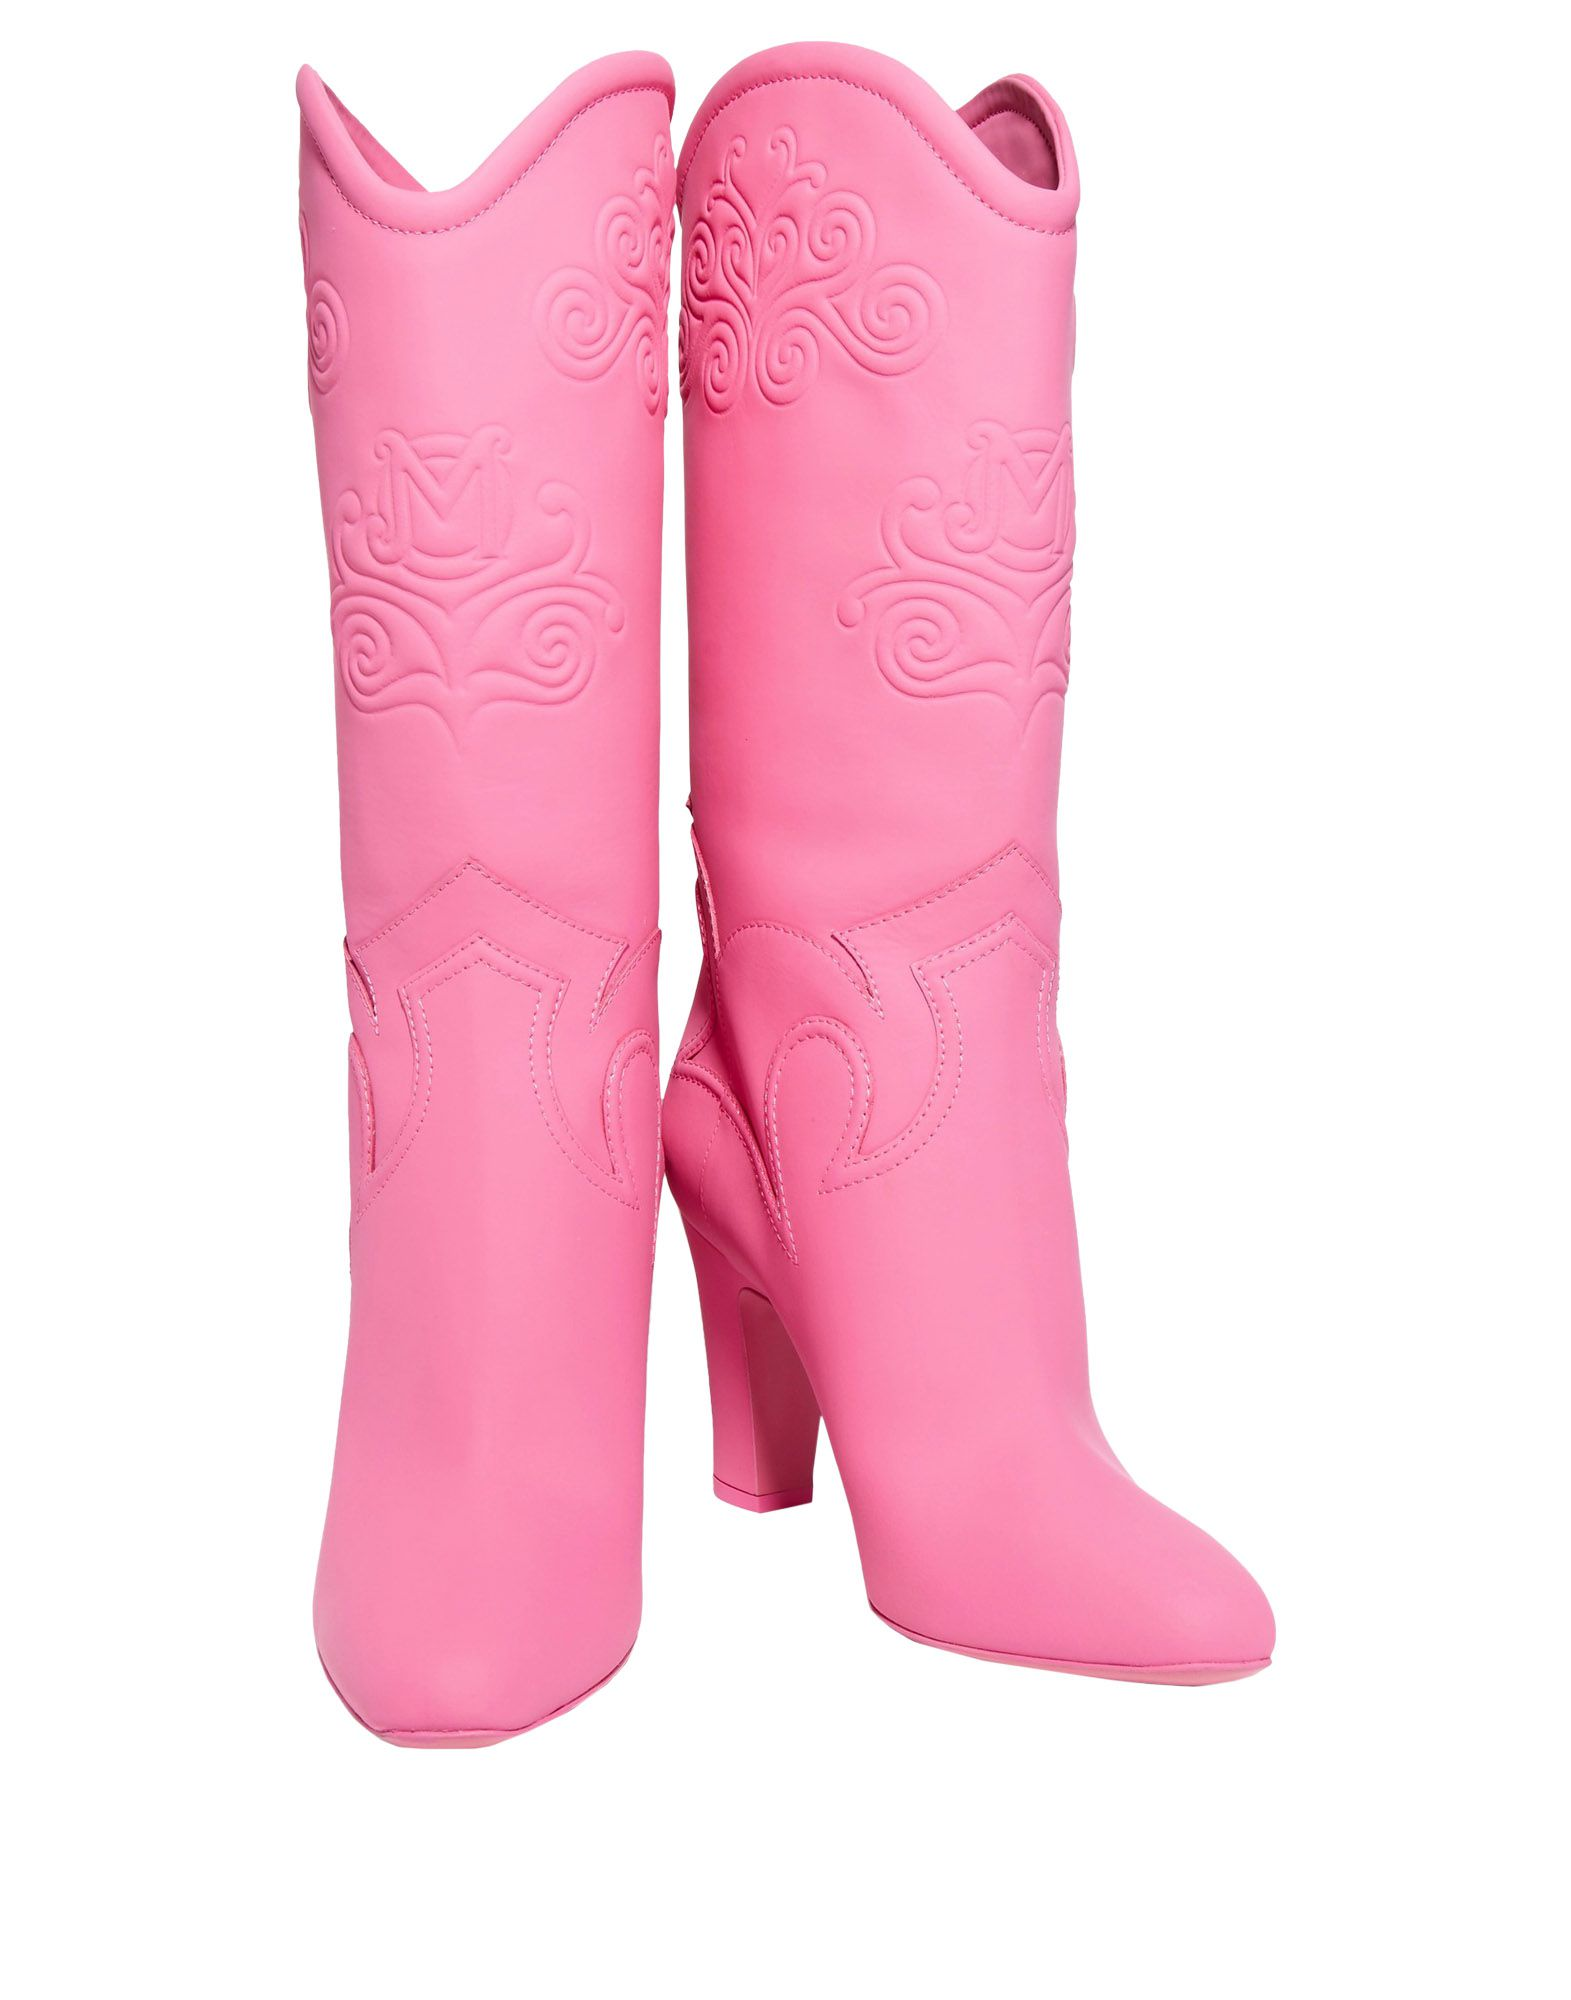 Moda Stivali Stivali Moda Moschino Donna - 11531825BS 5b3355